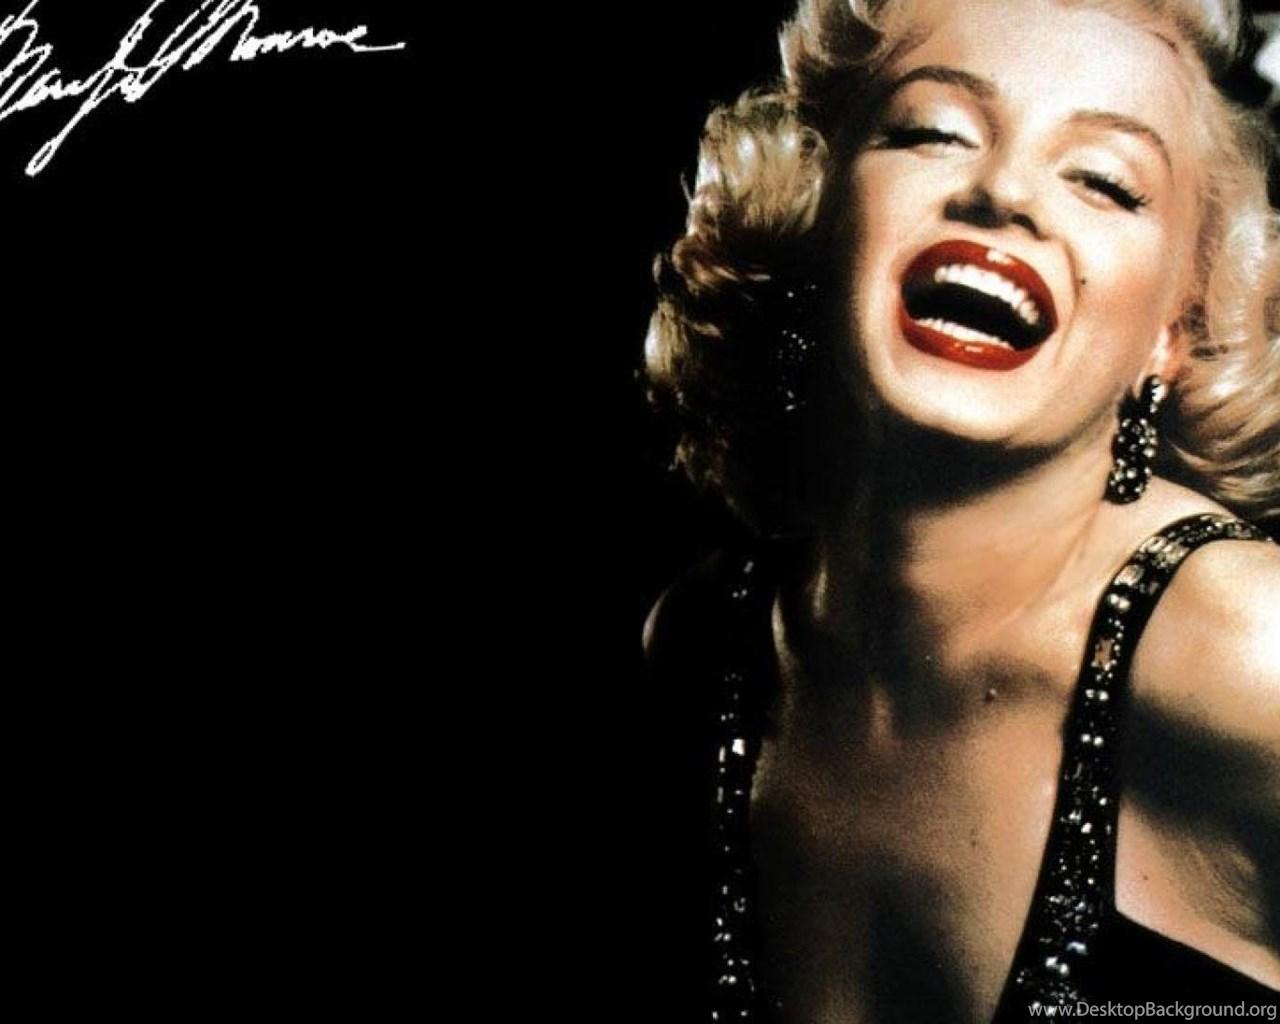 Monroe wallpapers free marilyn monroe download desktop background - Marilyn monroe wallpaper download ...